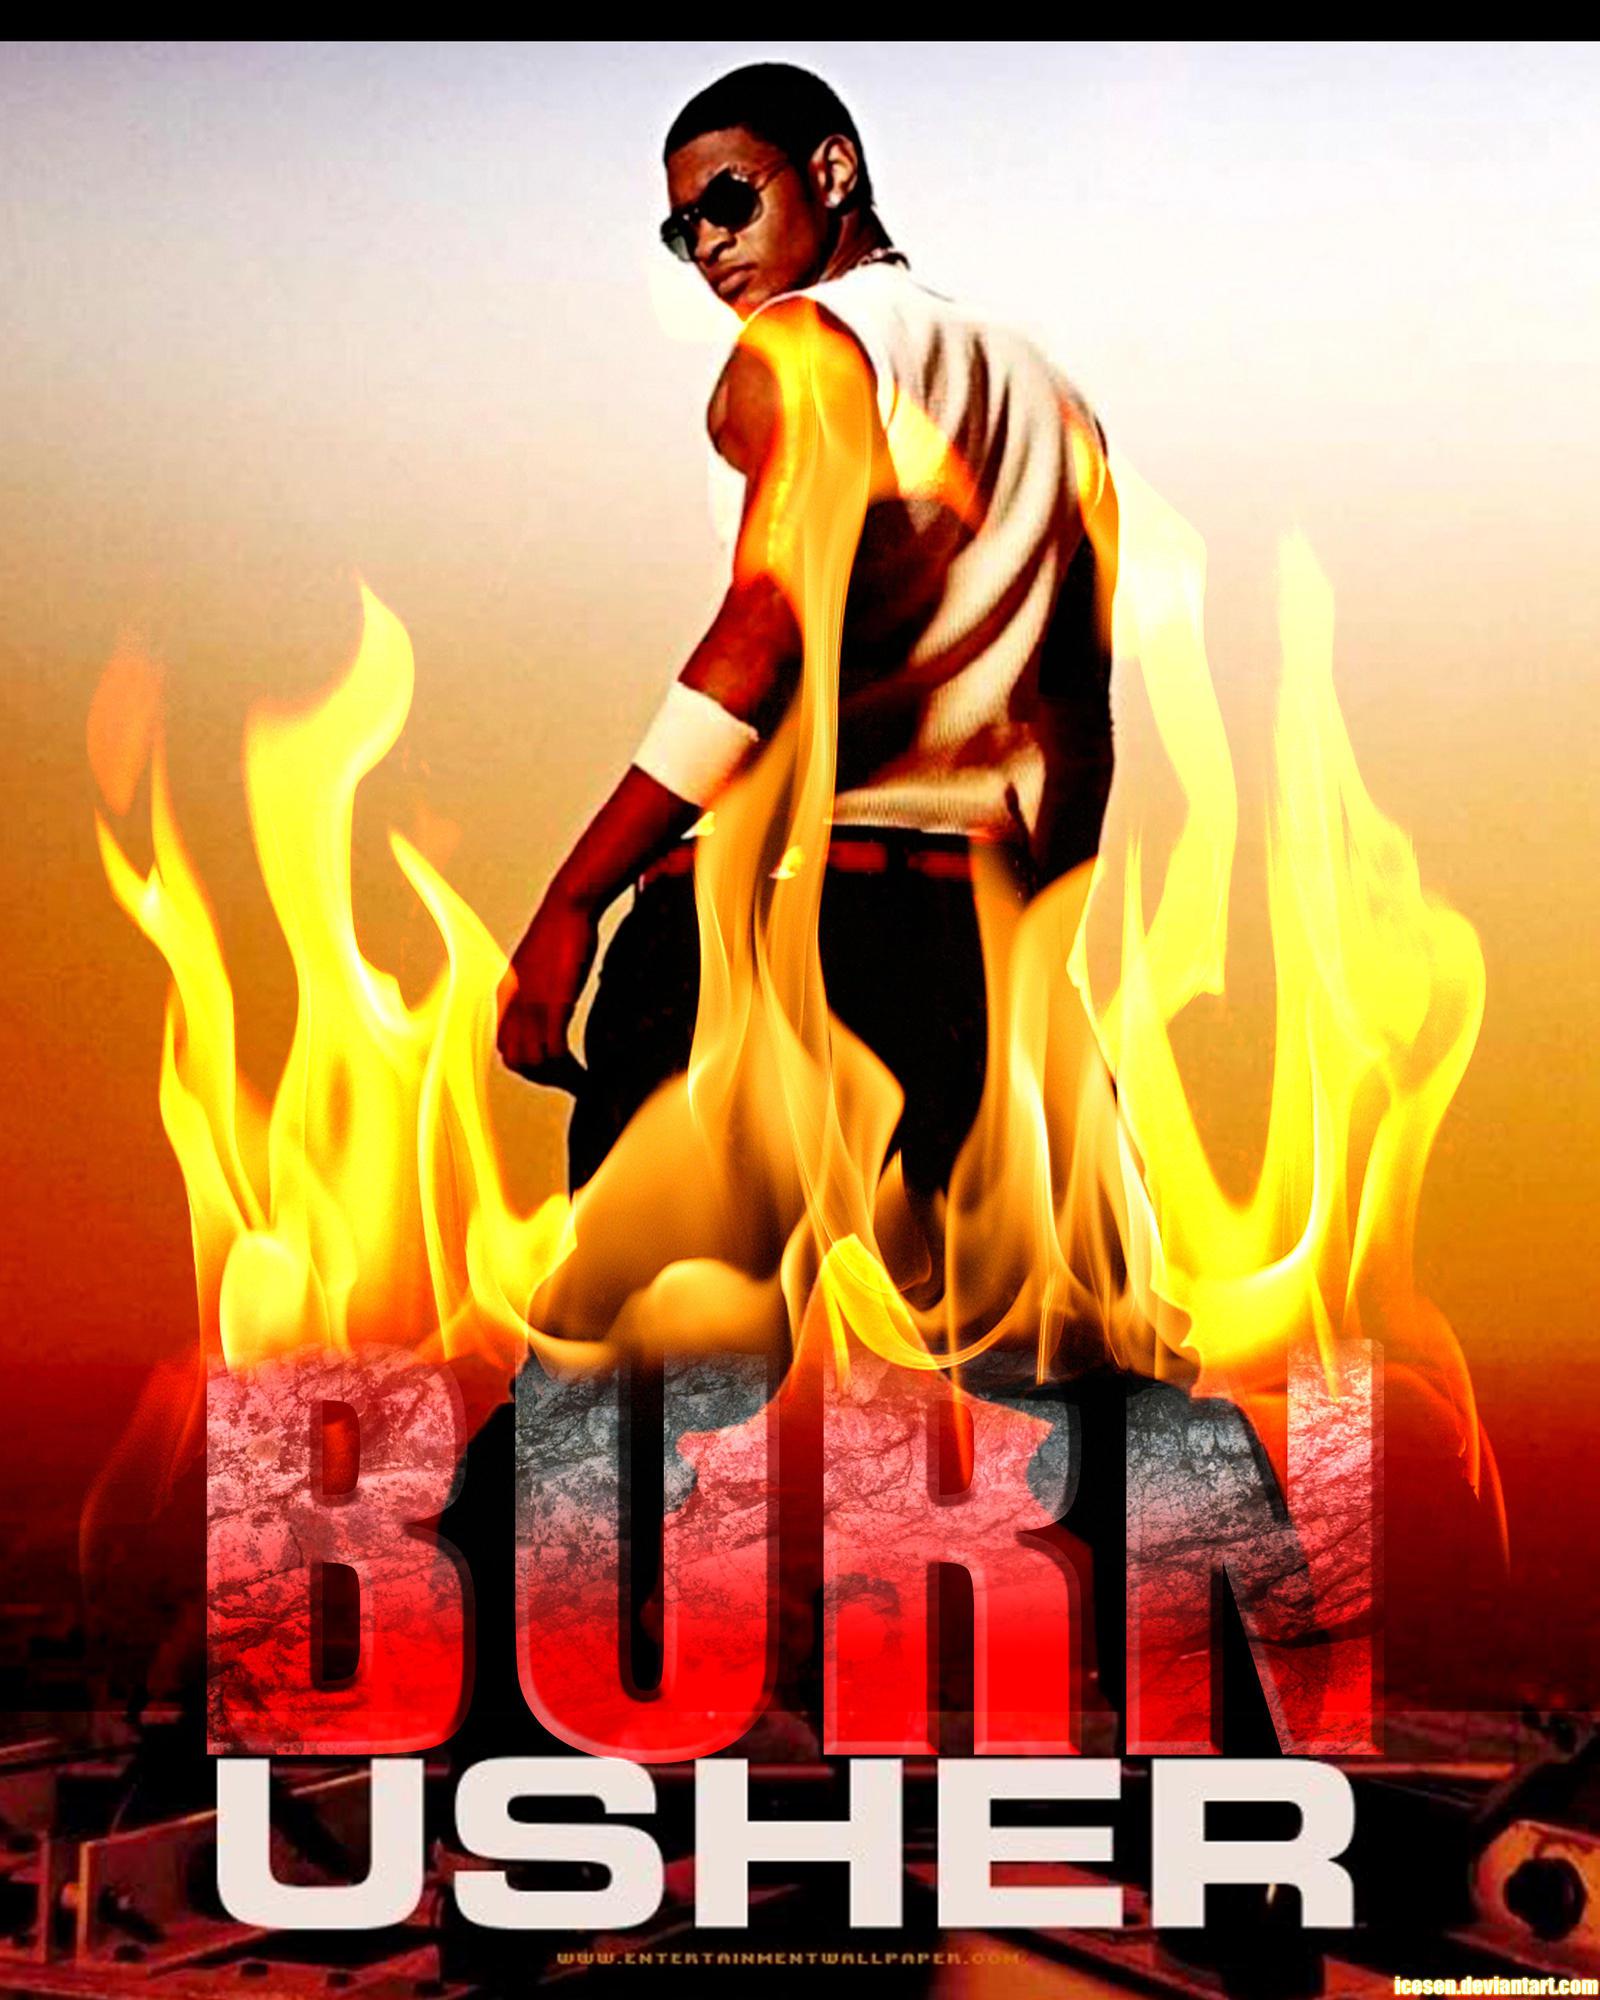 Burn-Usher by icesen on DeviantArt